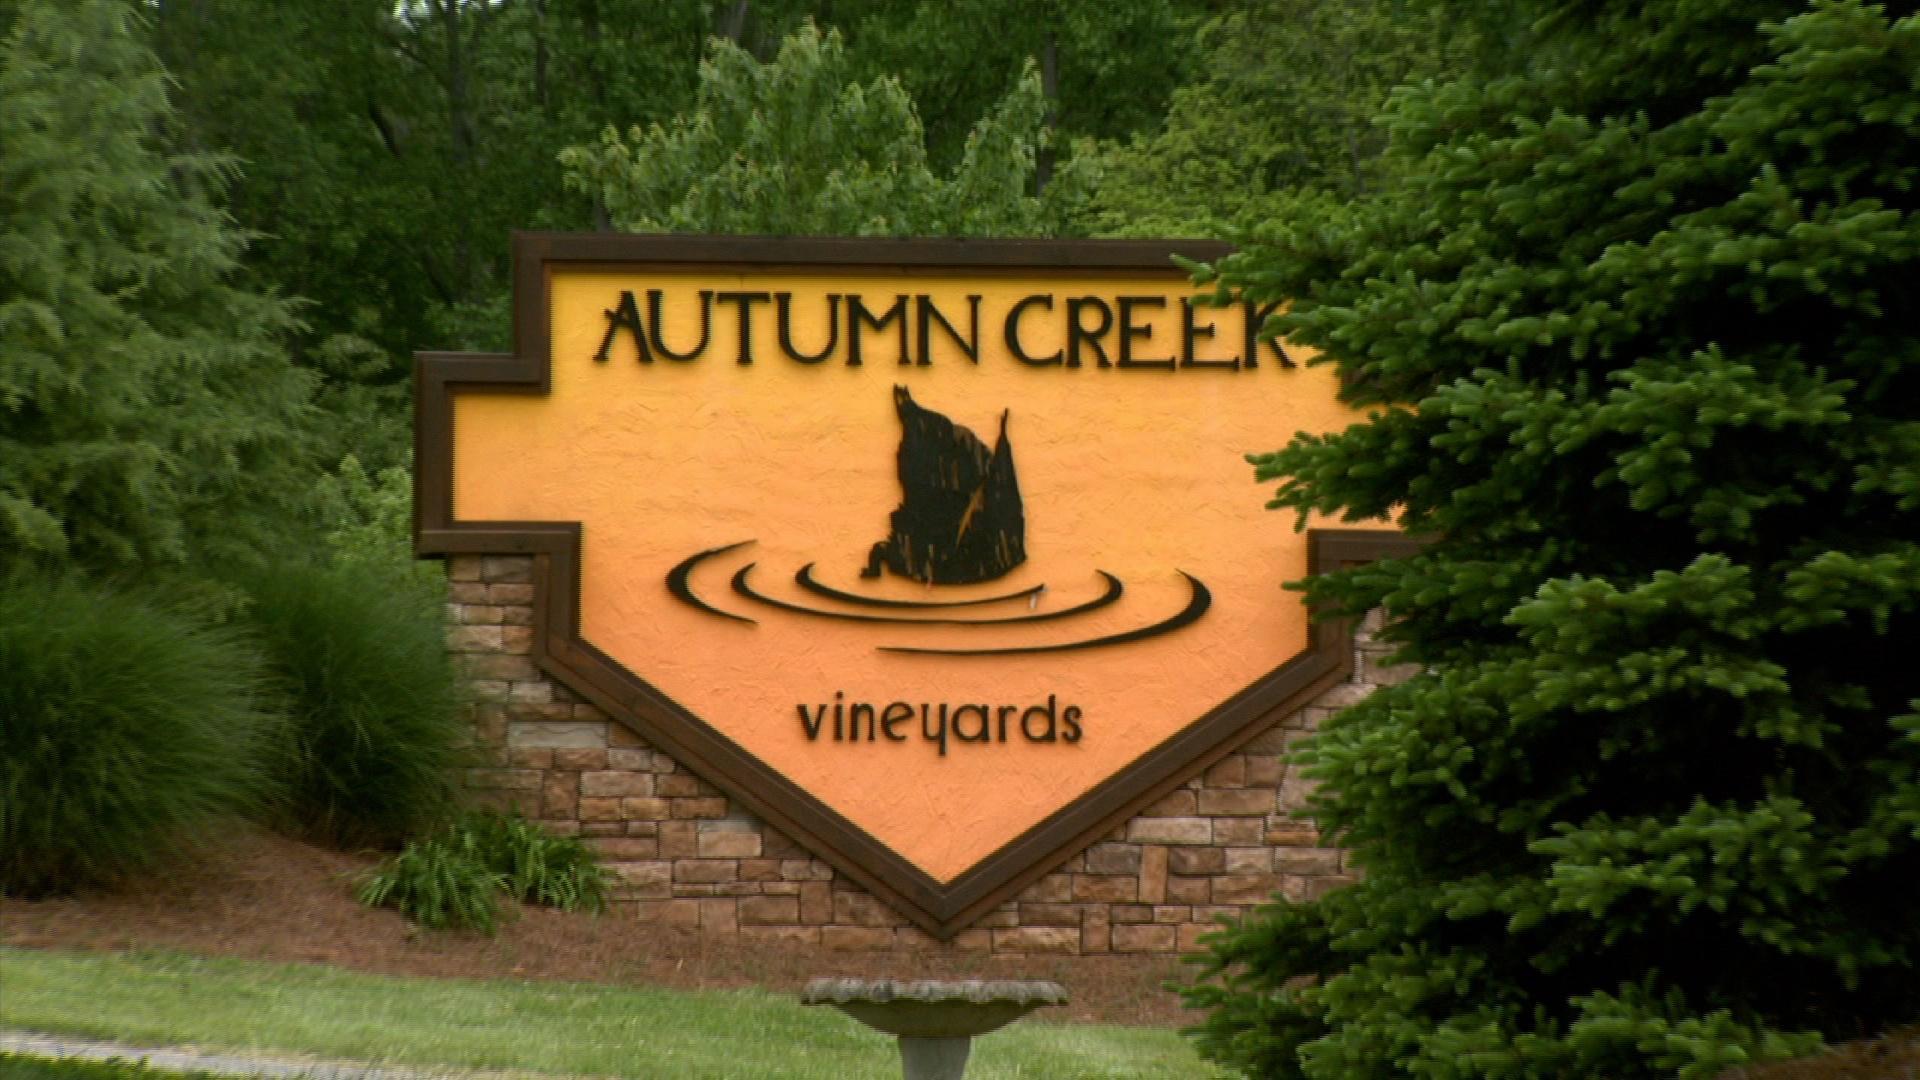 Autumn Creek Vineyards image